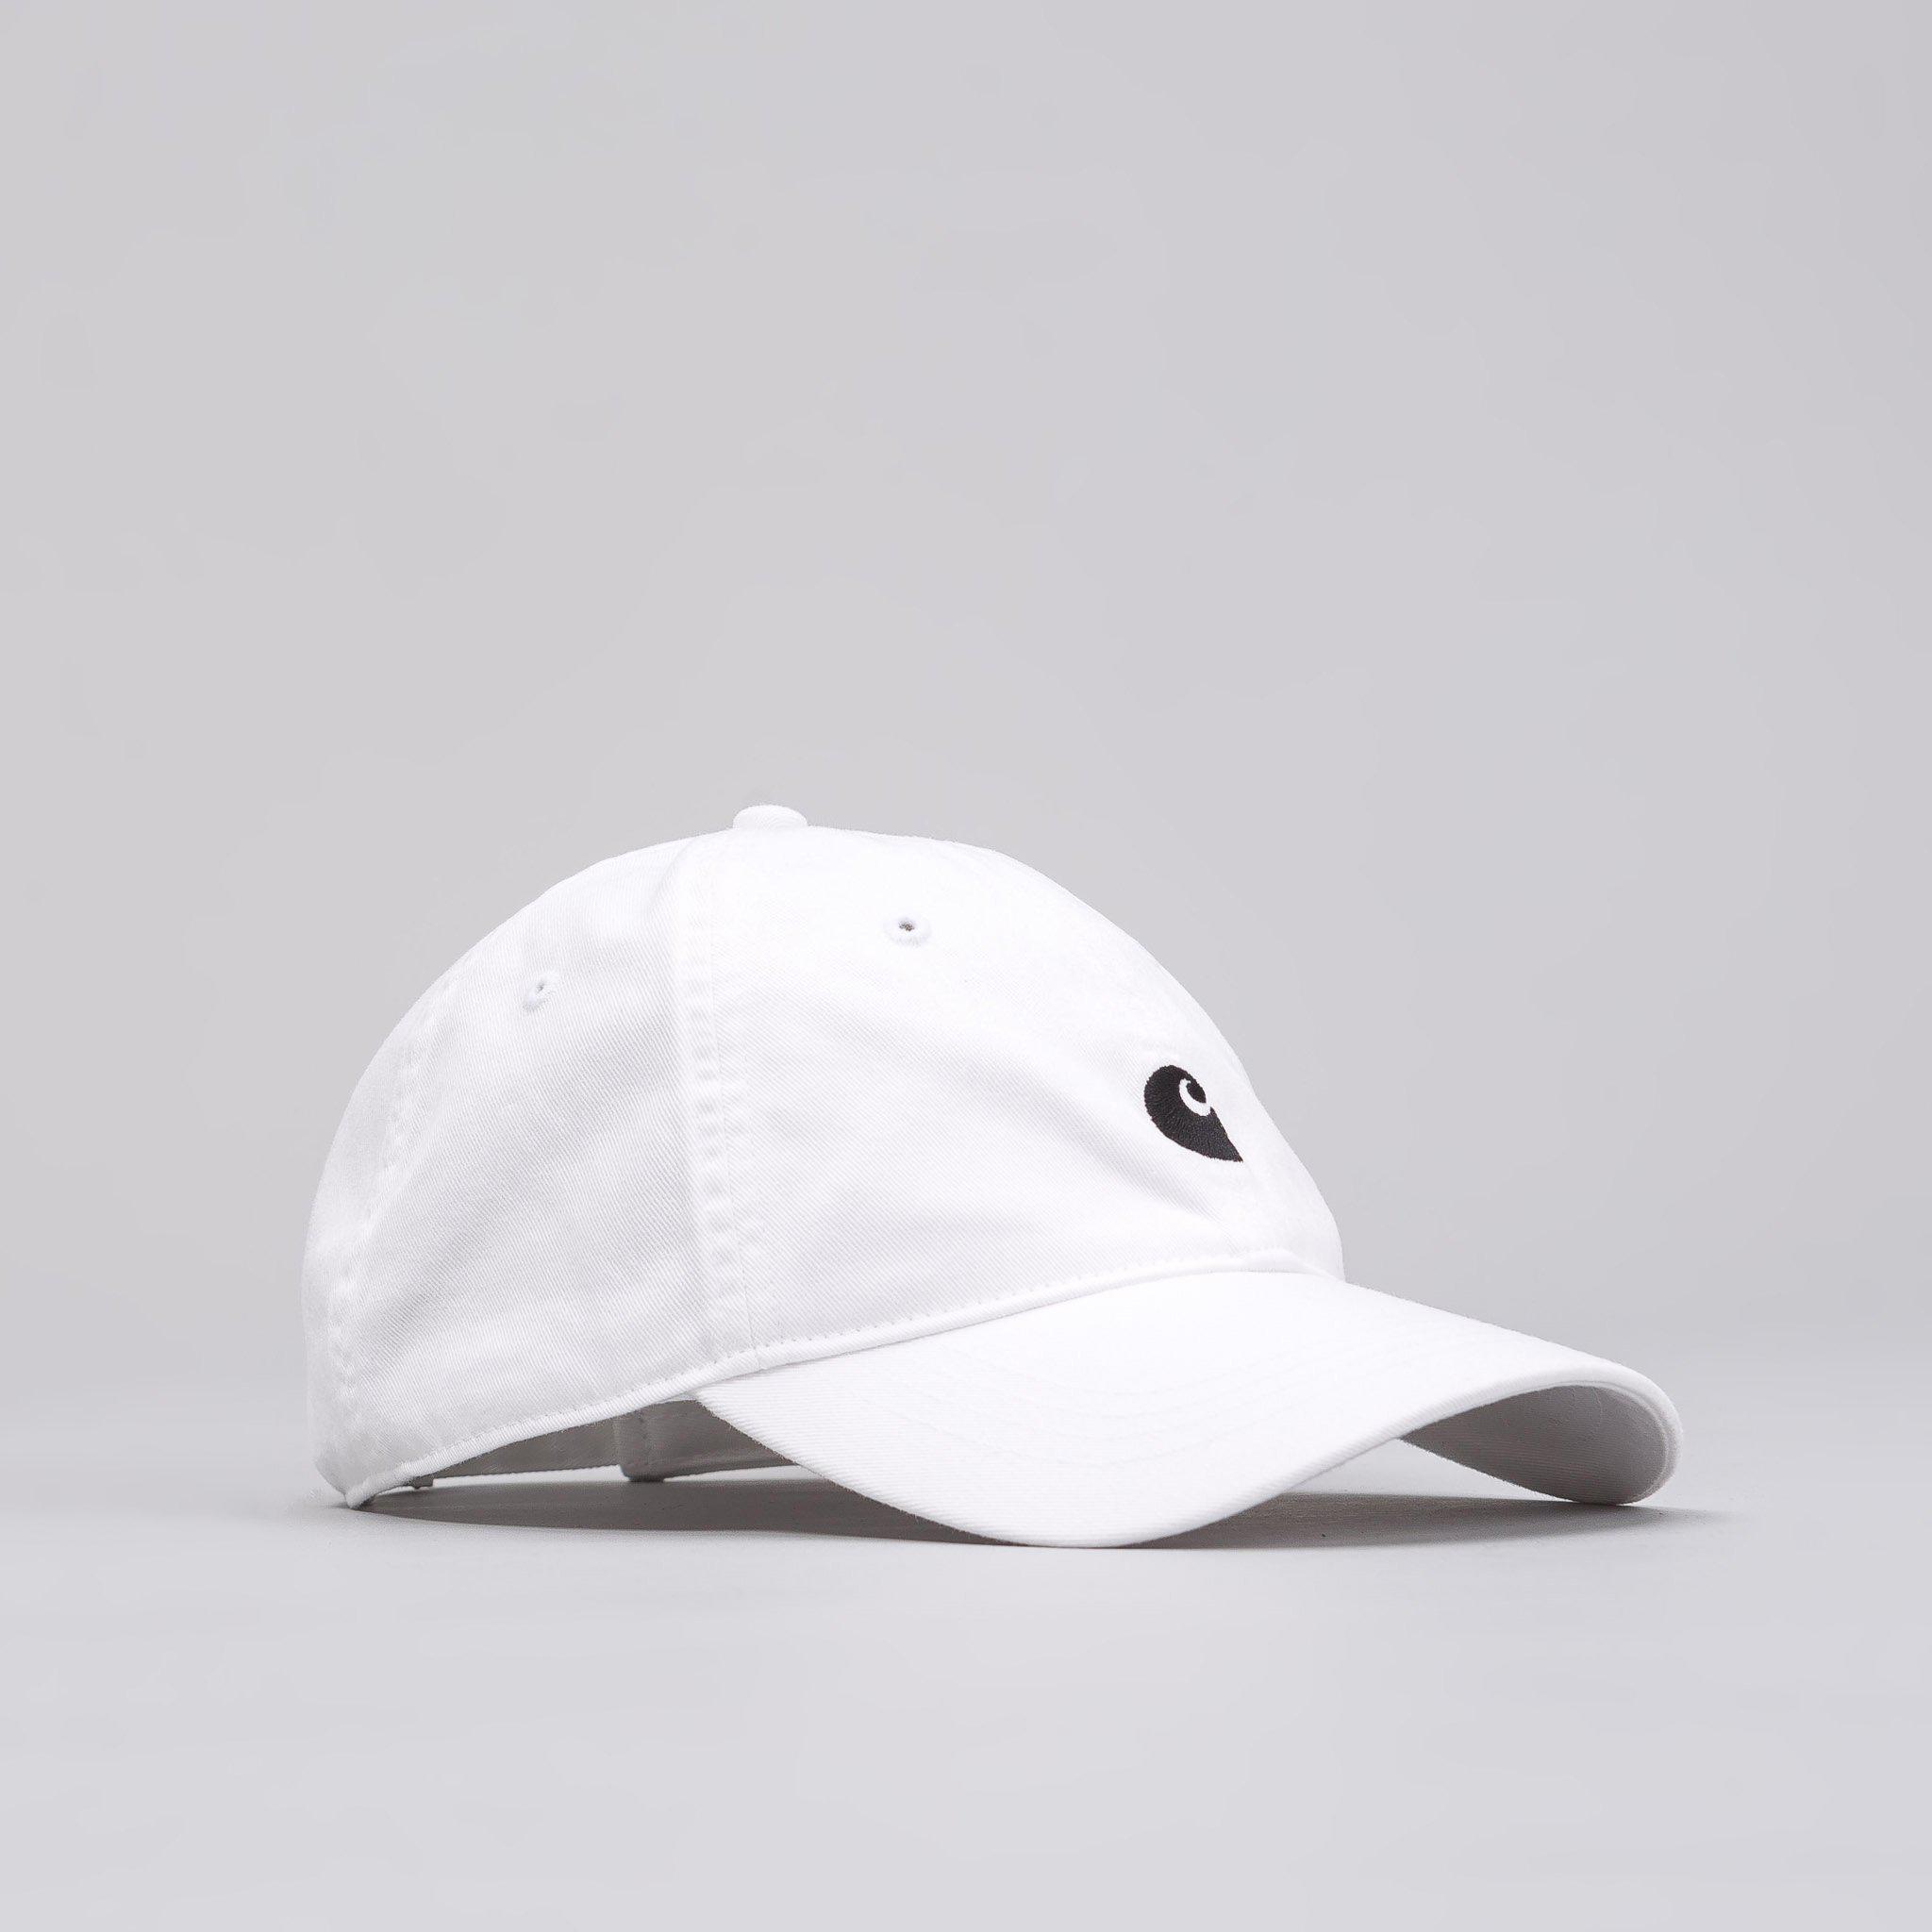 Lyst - Carhartt WIP Major Cap In White black in White for Men a6dd2acb6b60